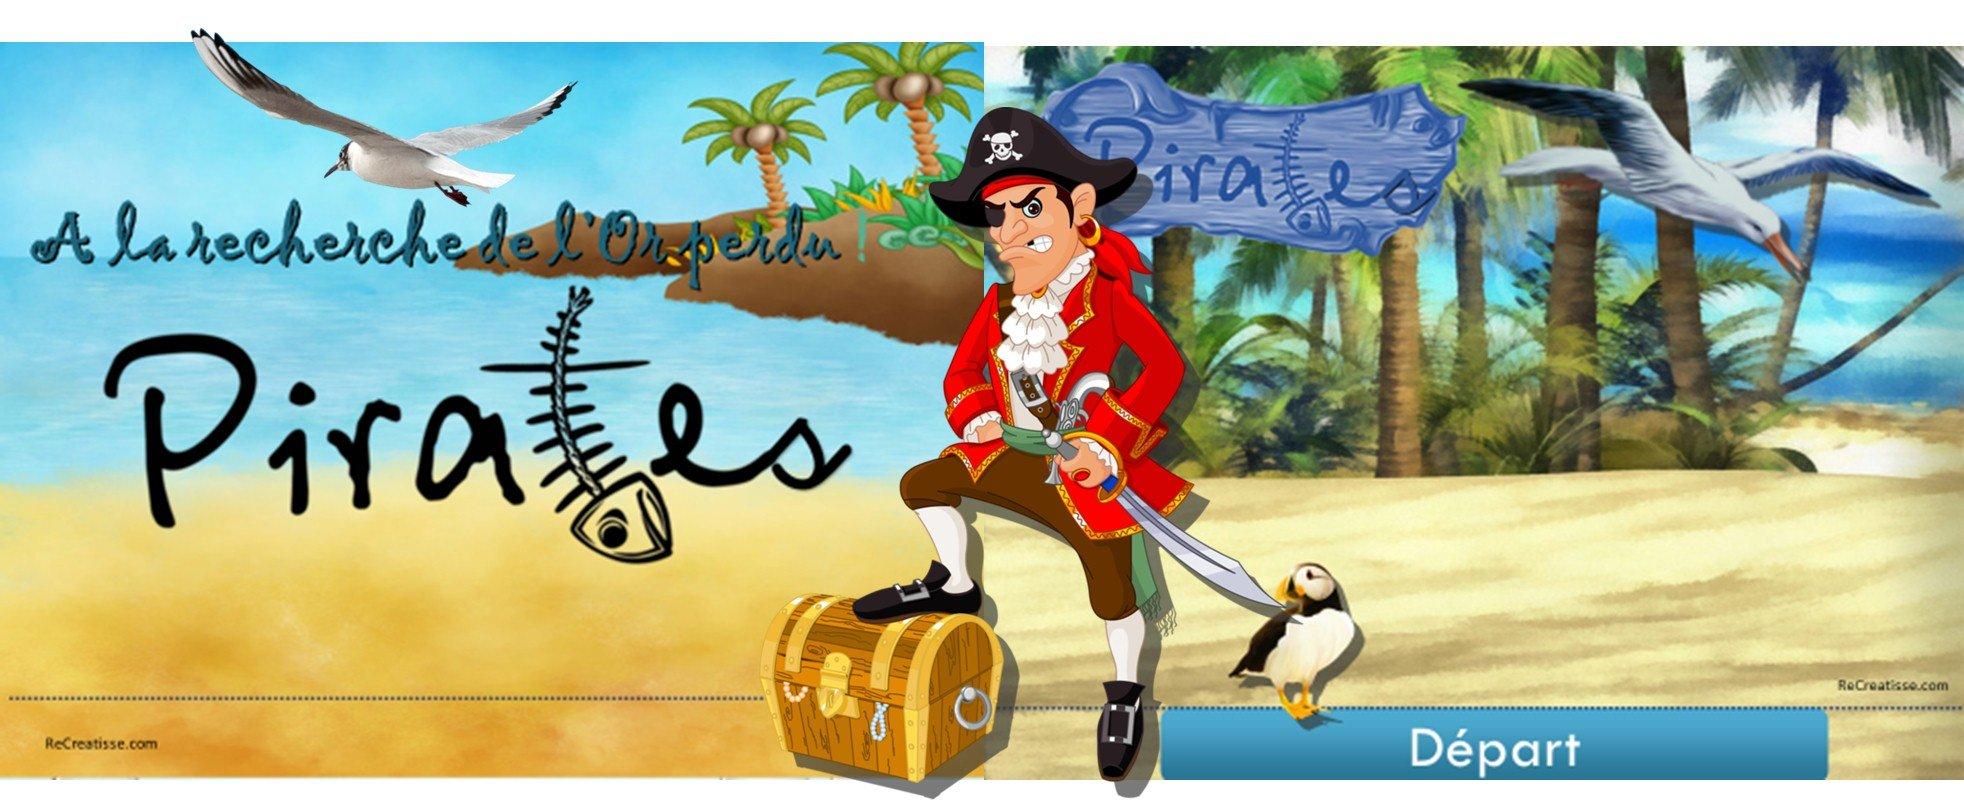 RITUEL et JEU  Le trsor des pirates  ReCreatisse